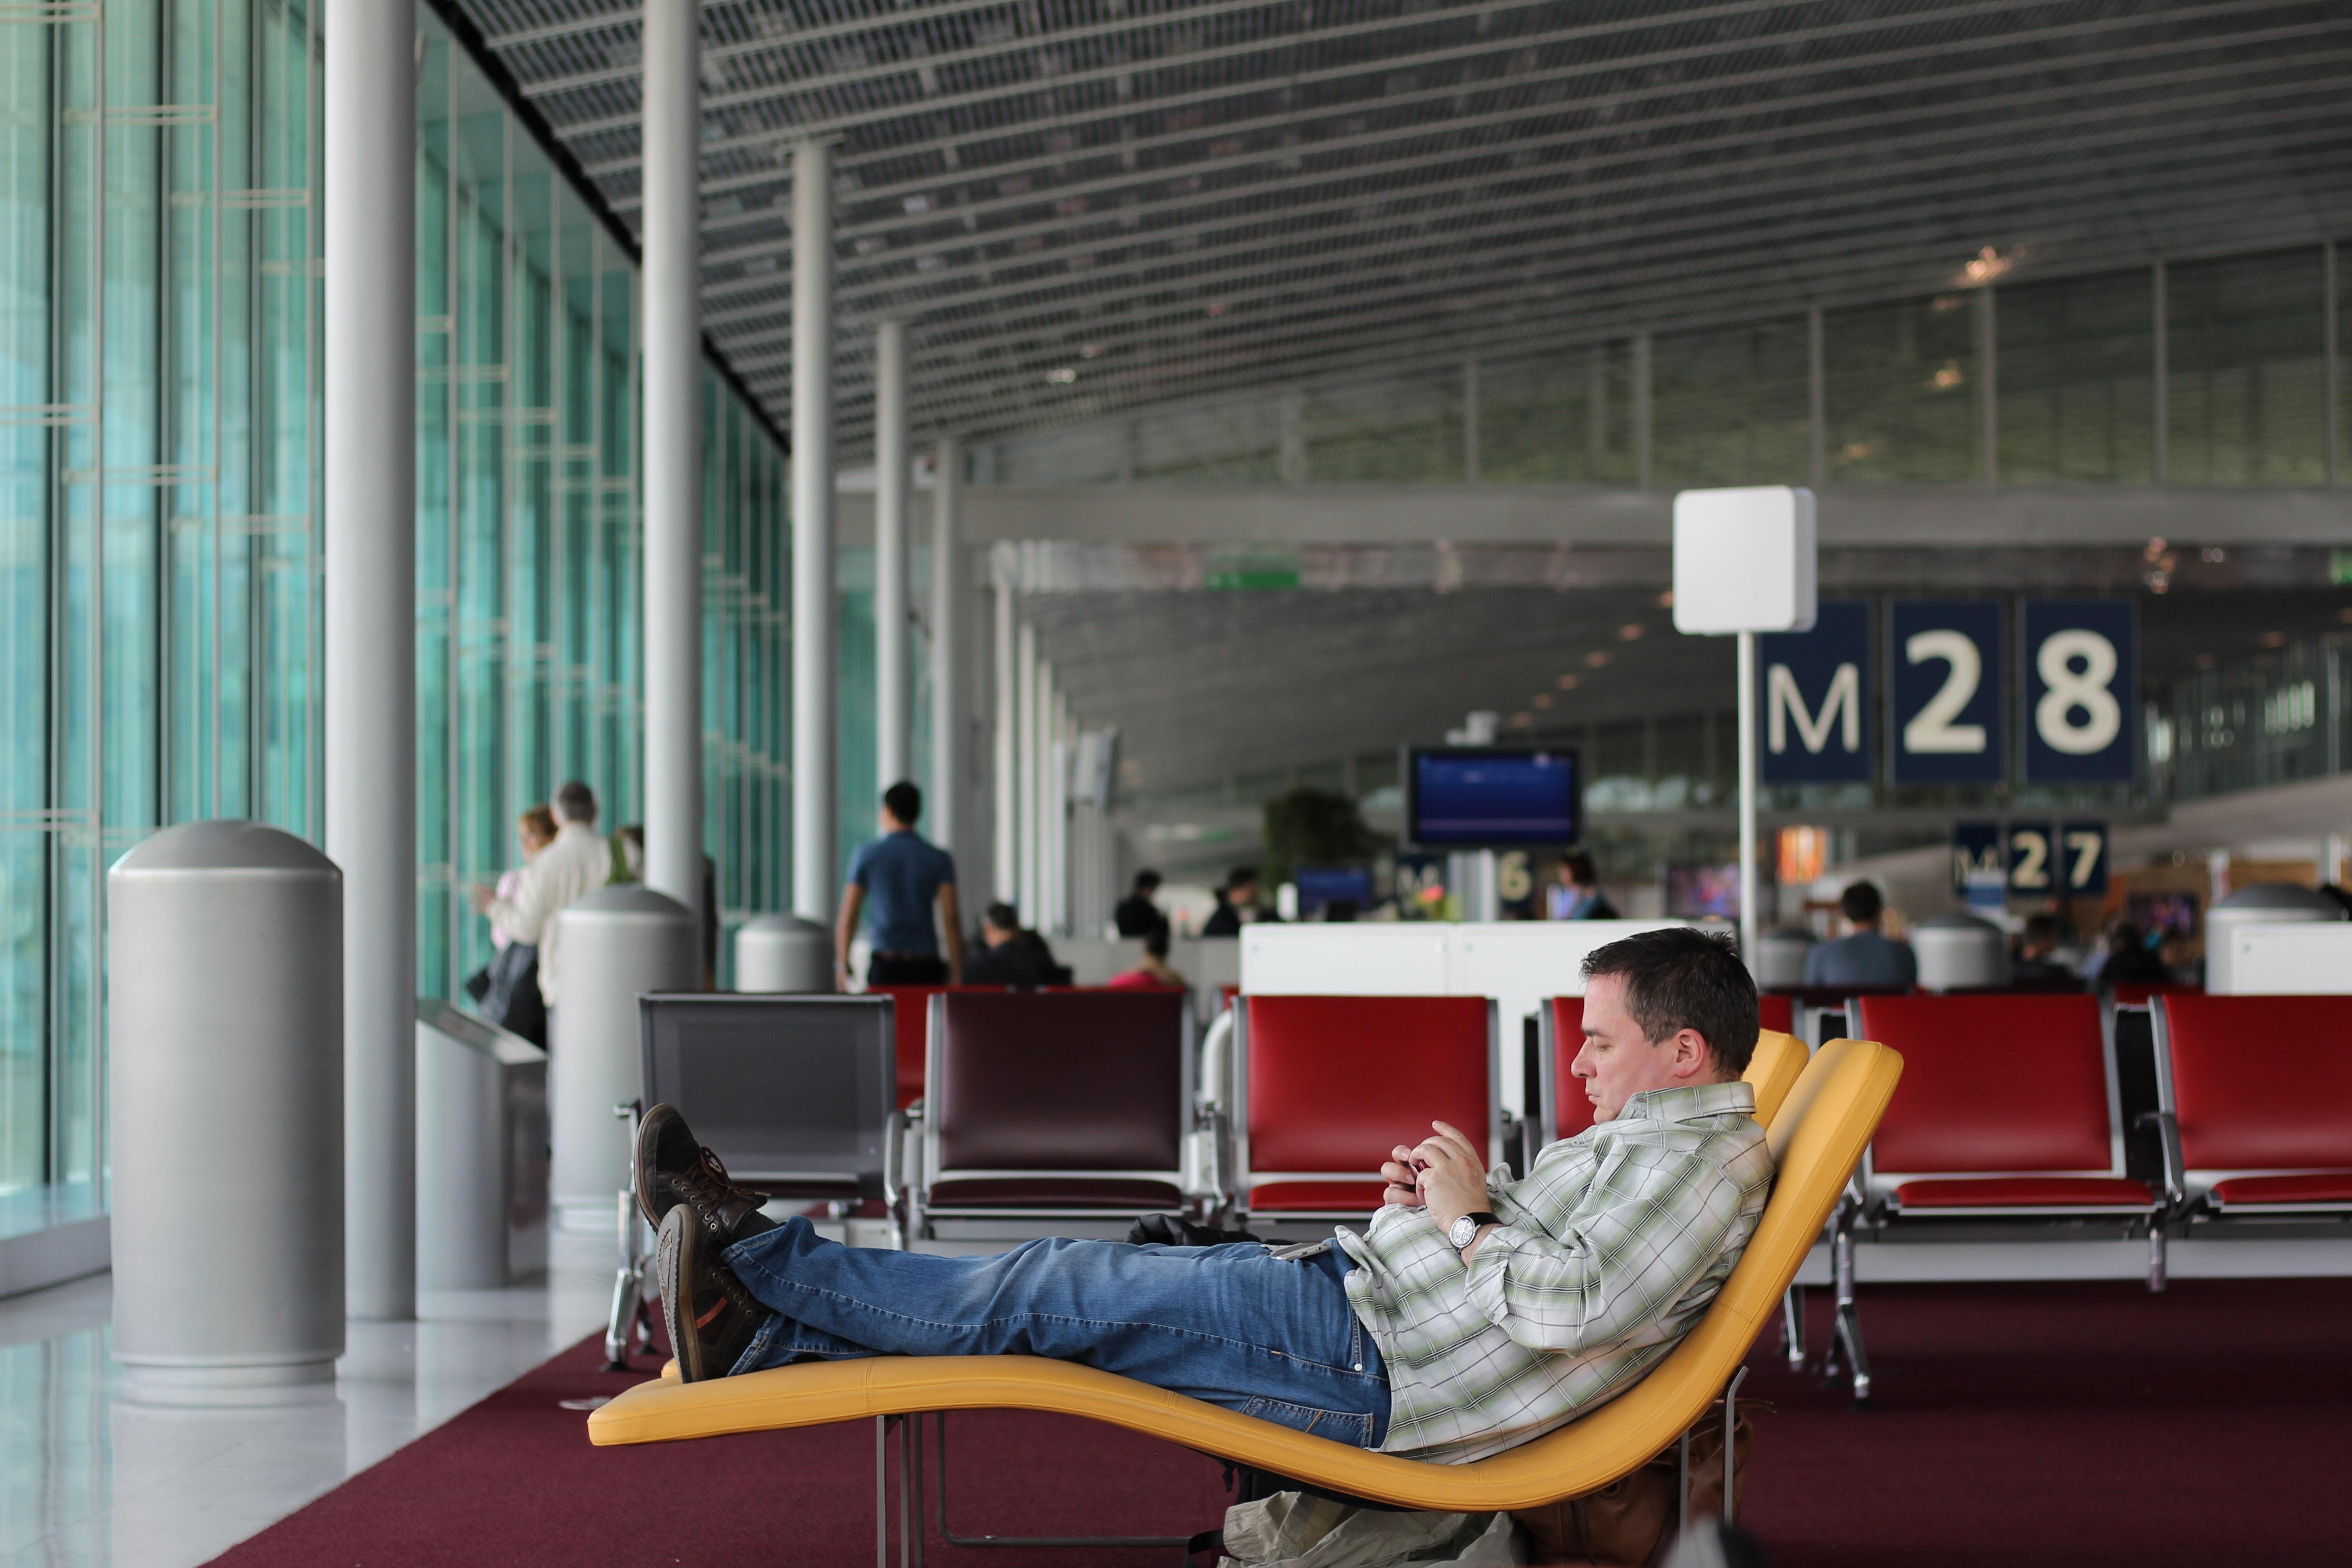 Airport customer